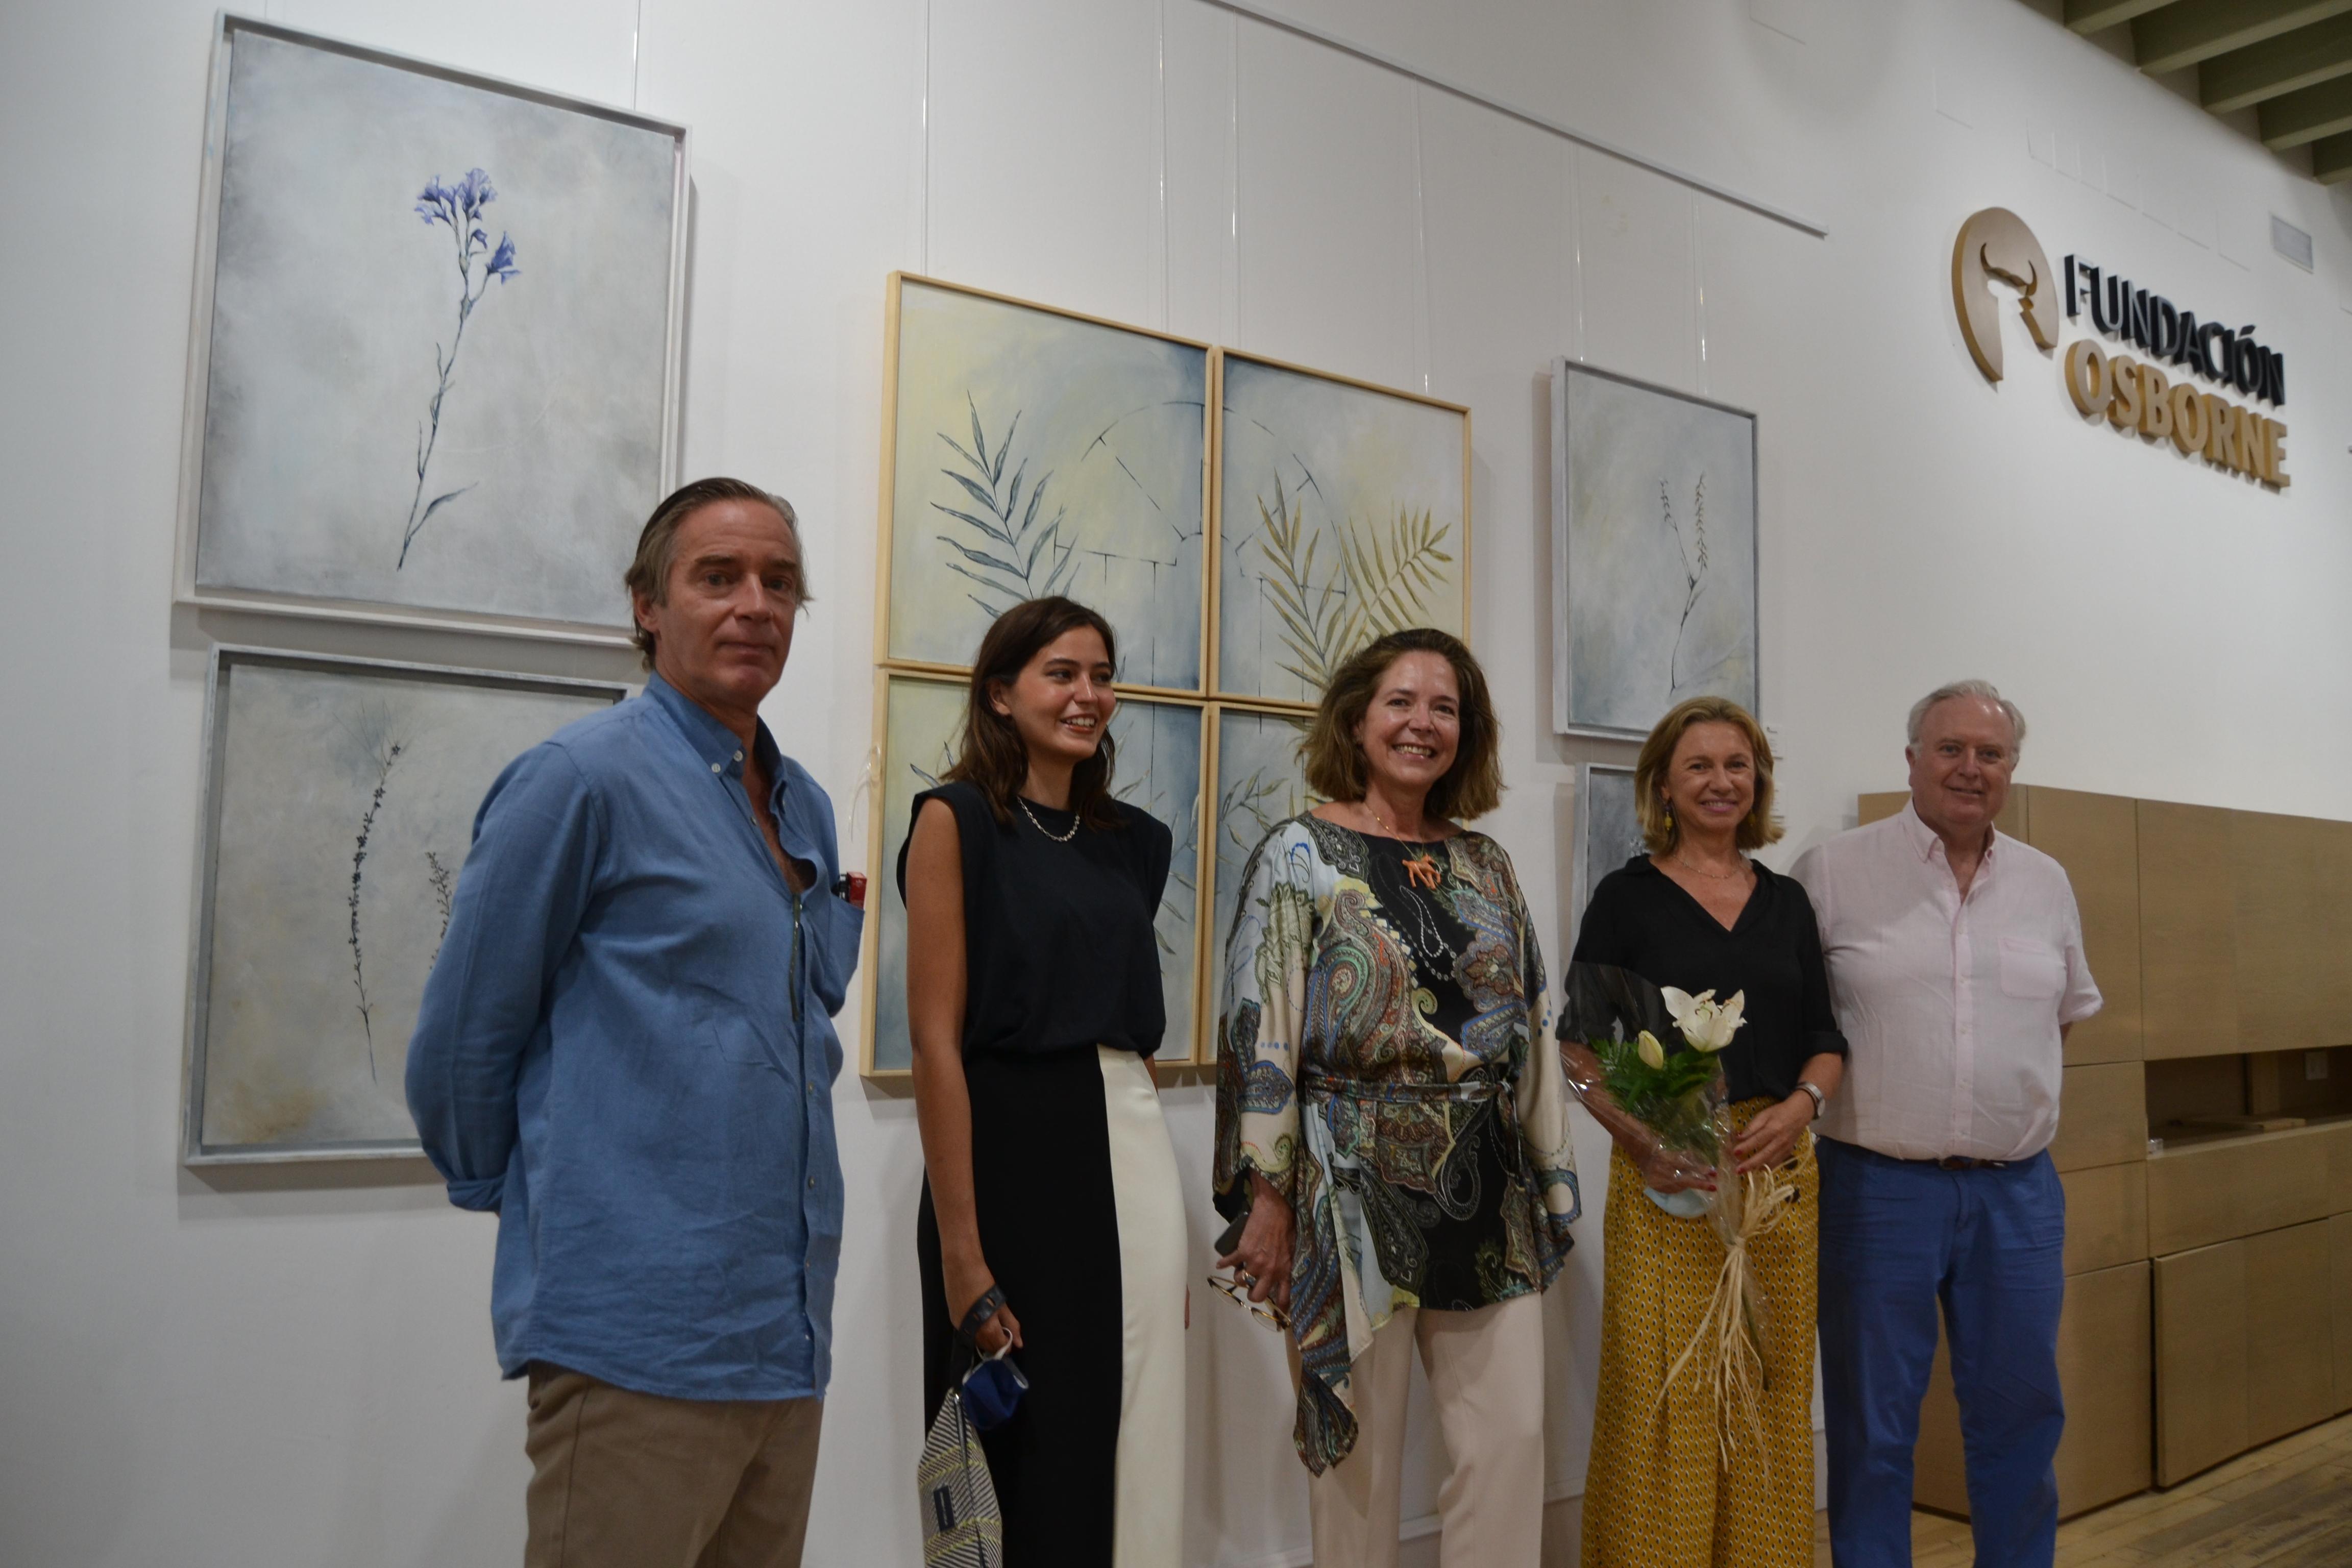 Tomas Osborne (presidente Fundación Osborne), Maria Luisa Peman, Angelika Popcev,Mercedes Alba y David Maldonado.